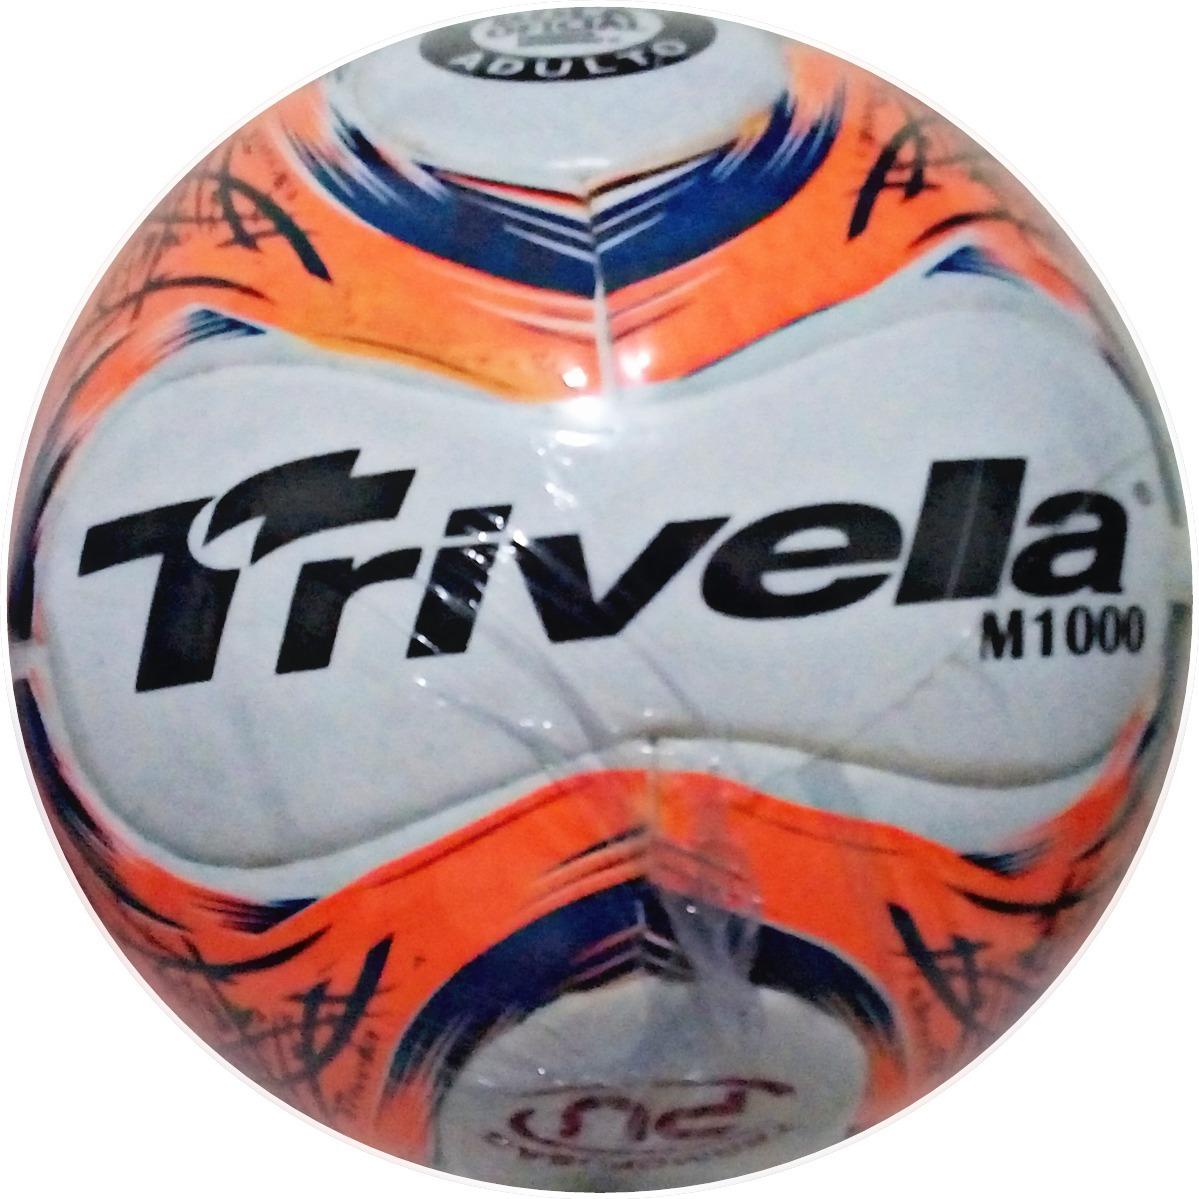 63547ea288 bola futsal futebol trivella original promoção - brasil gold. Carregando  zoom.